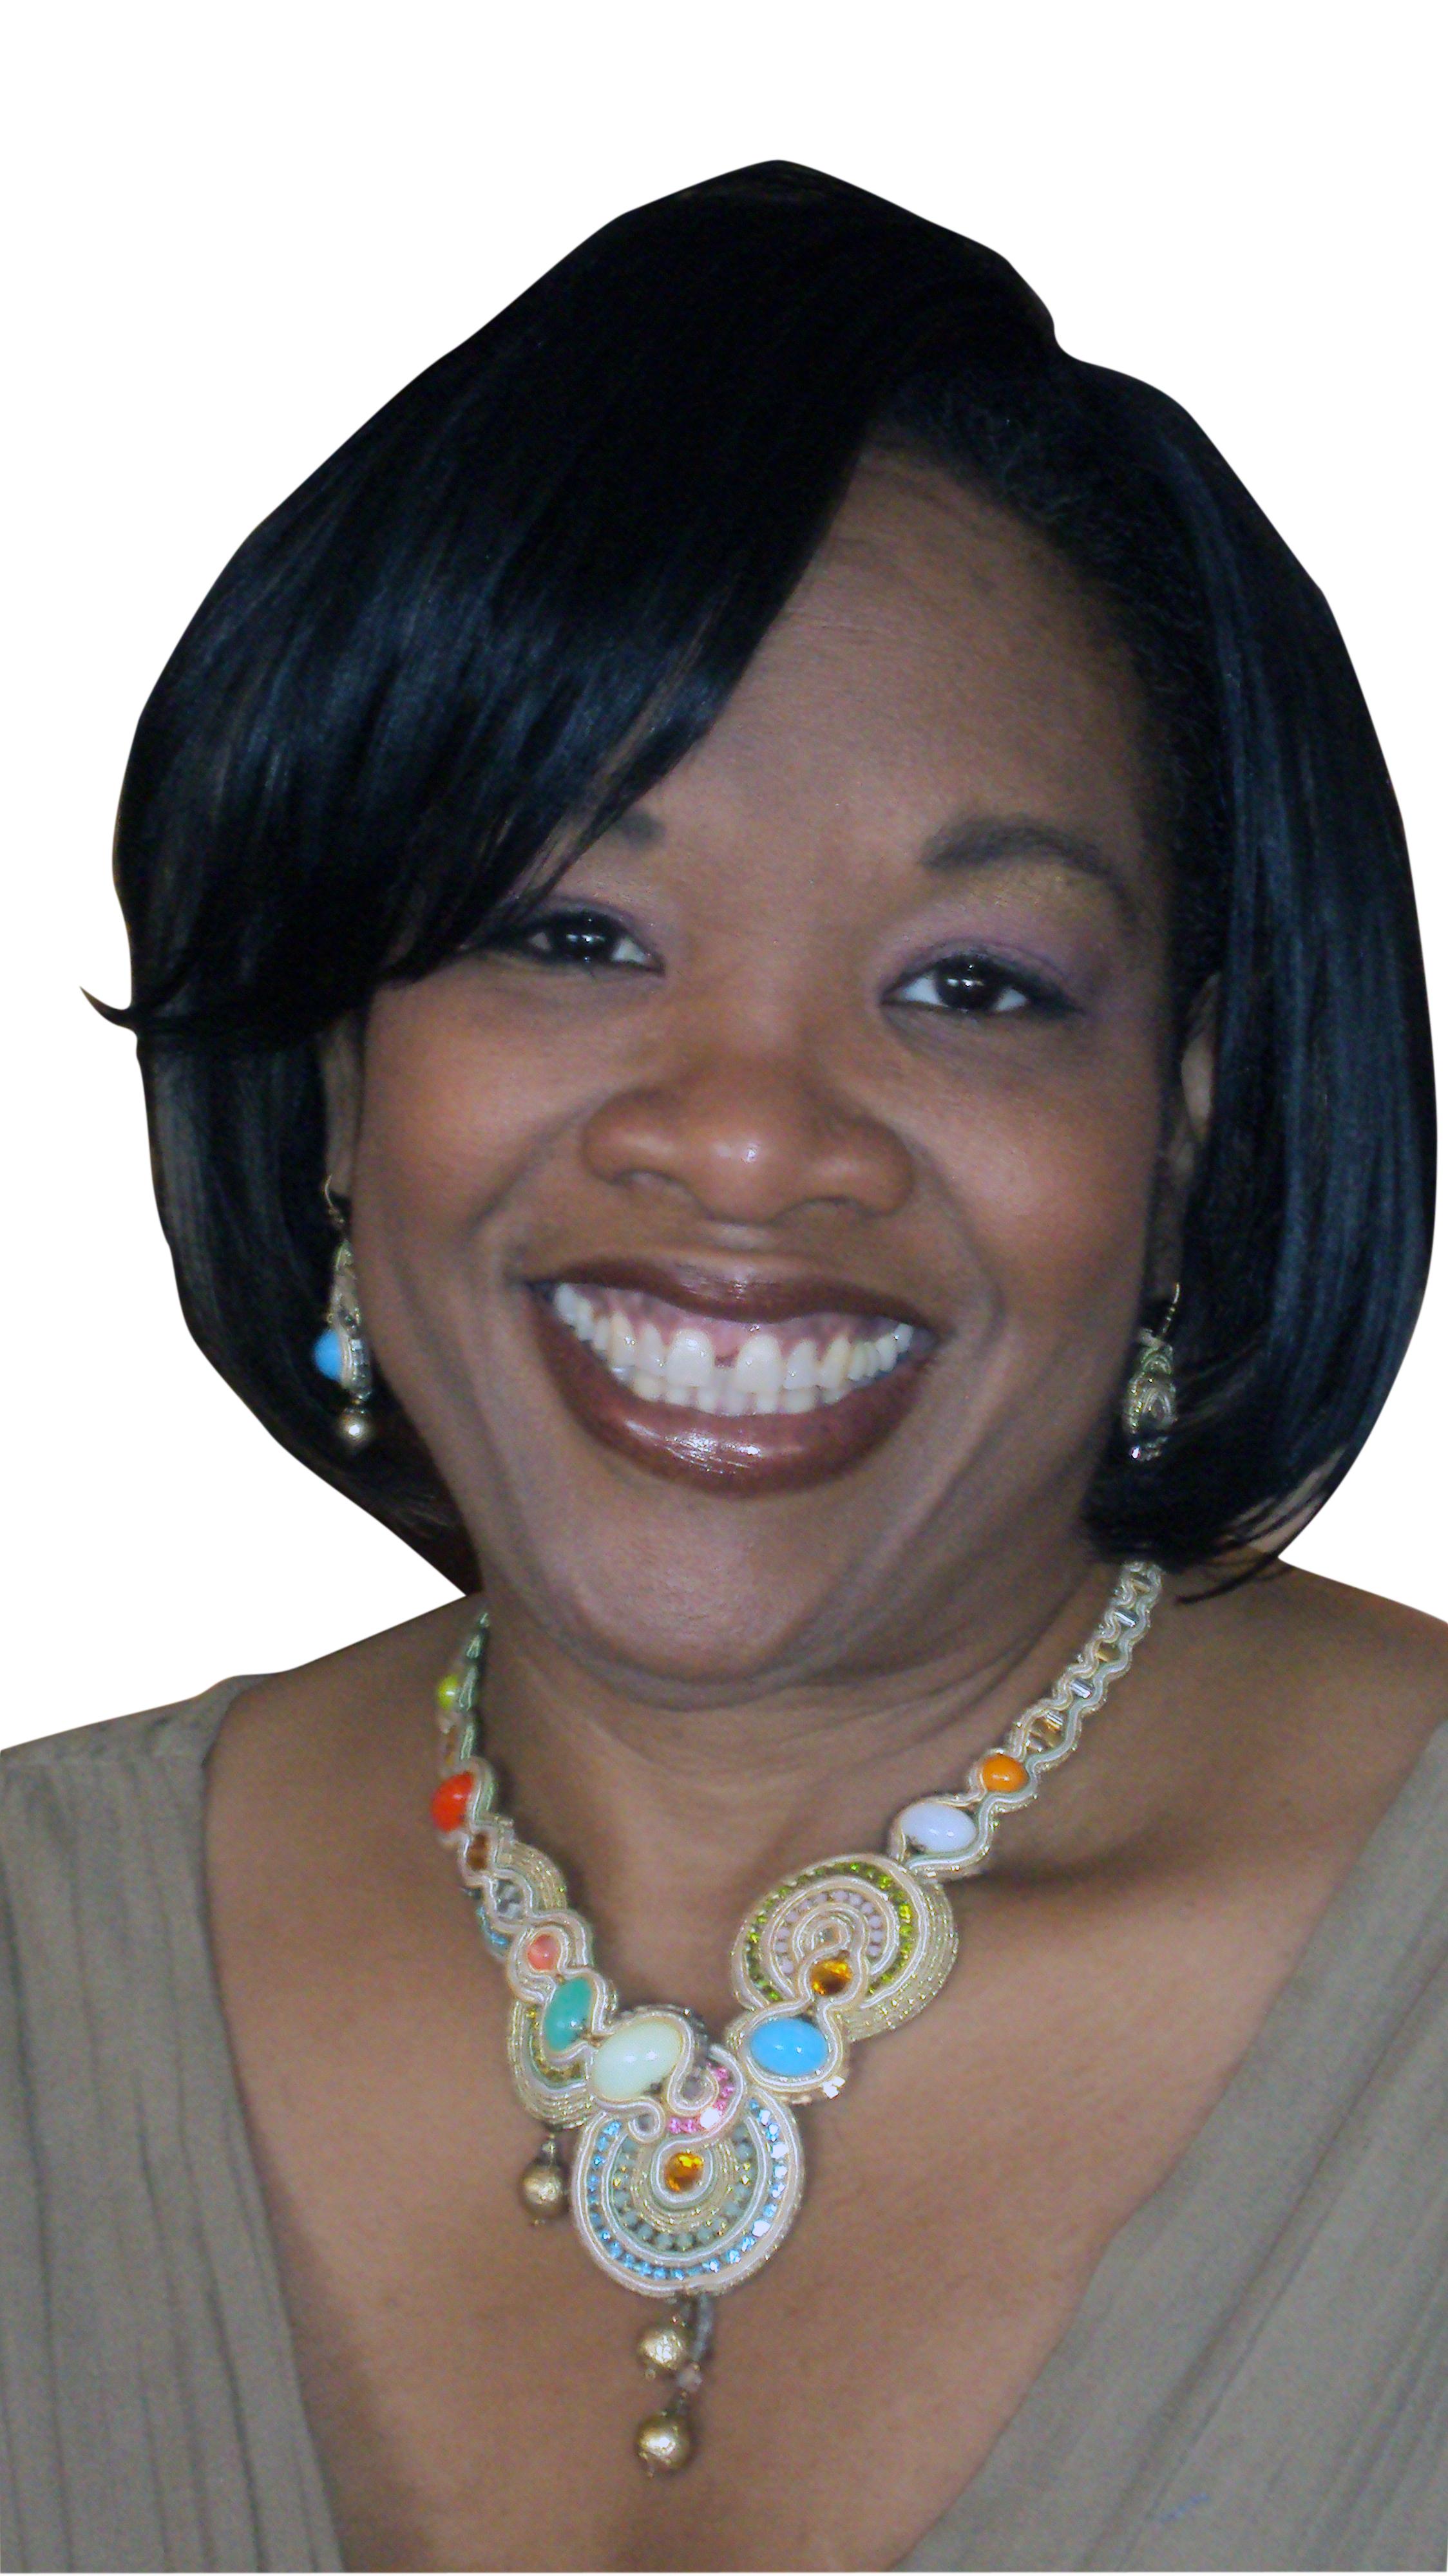 Soul Purpose CEO Nadine Thompson (Image: Courtesy of Subject)